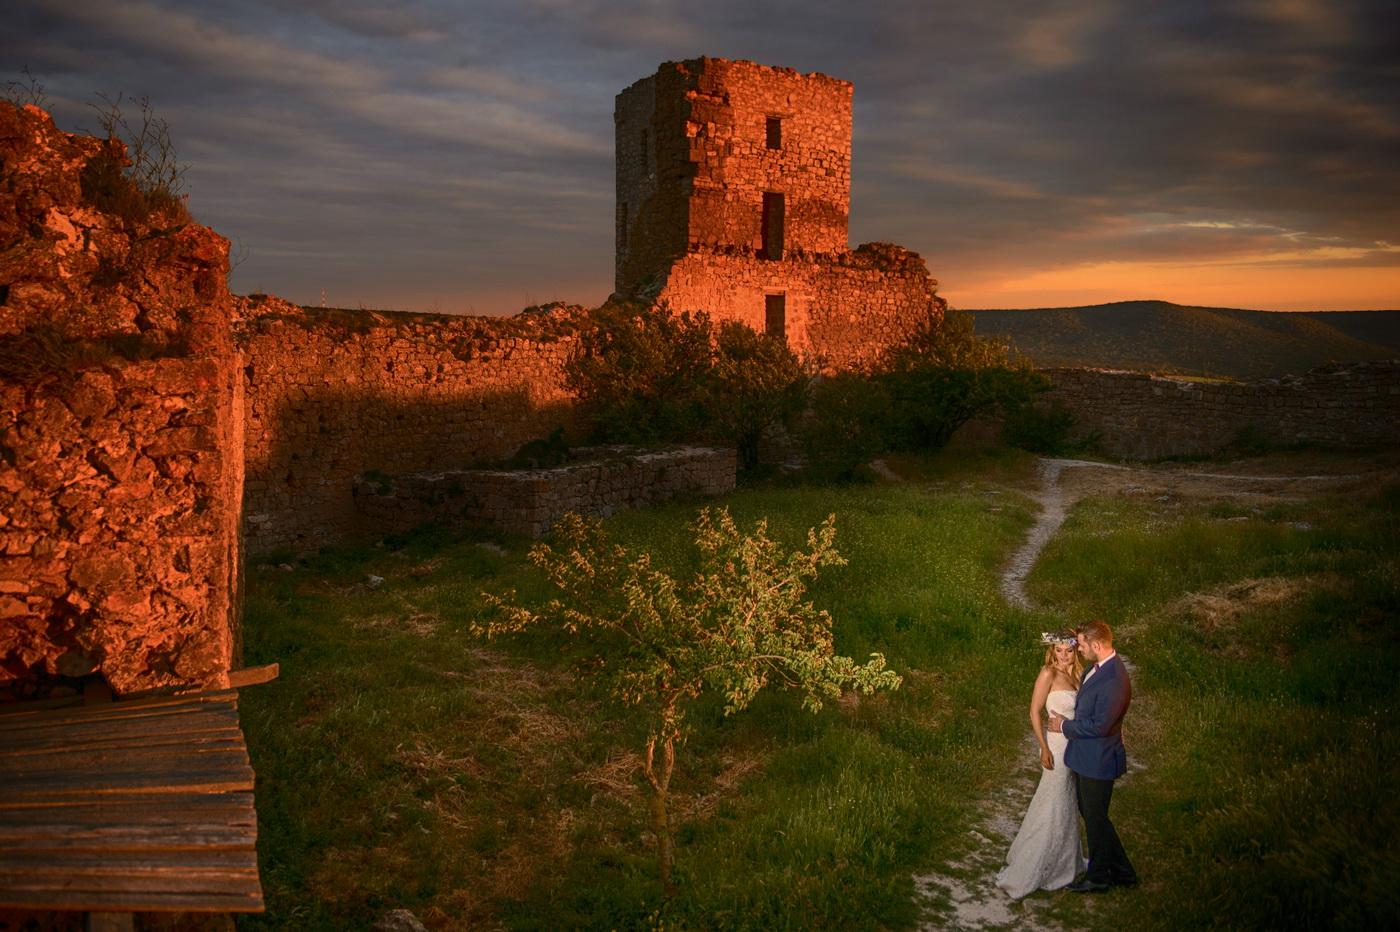 Destination Wedding Photographer_Marian Sterea_033.jpg